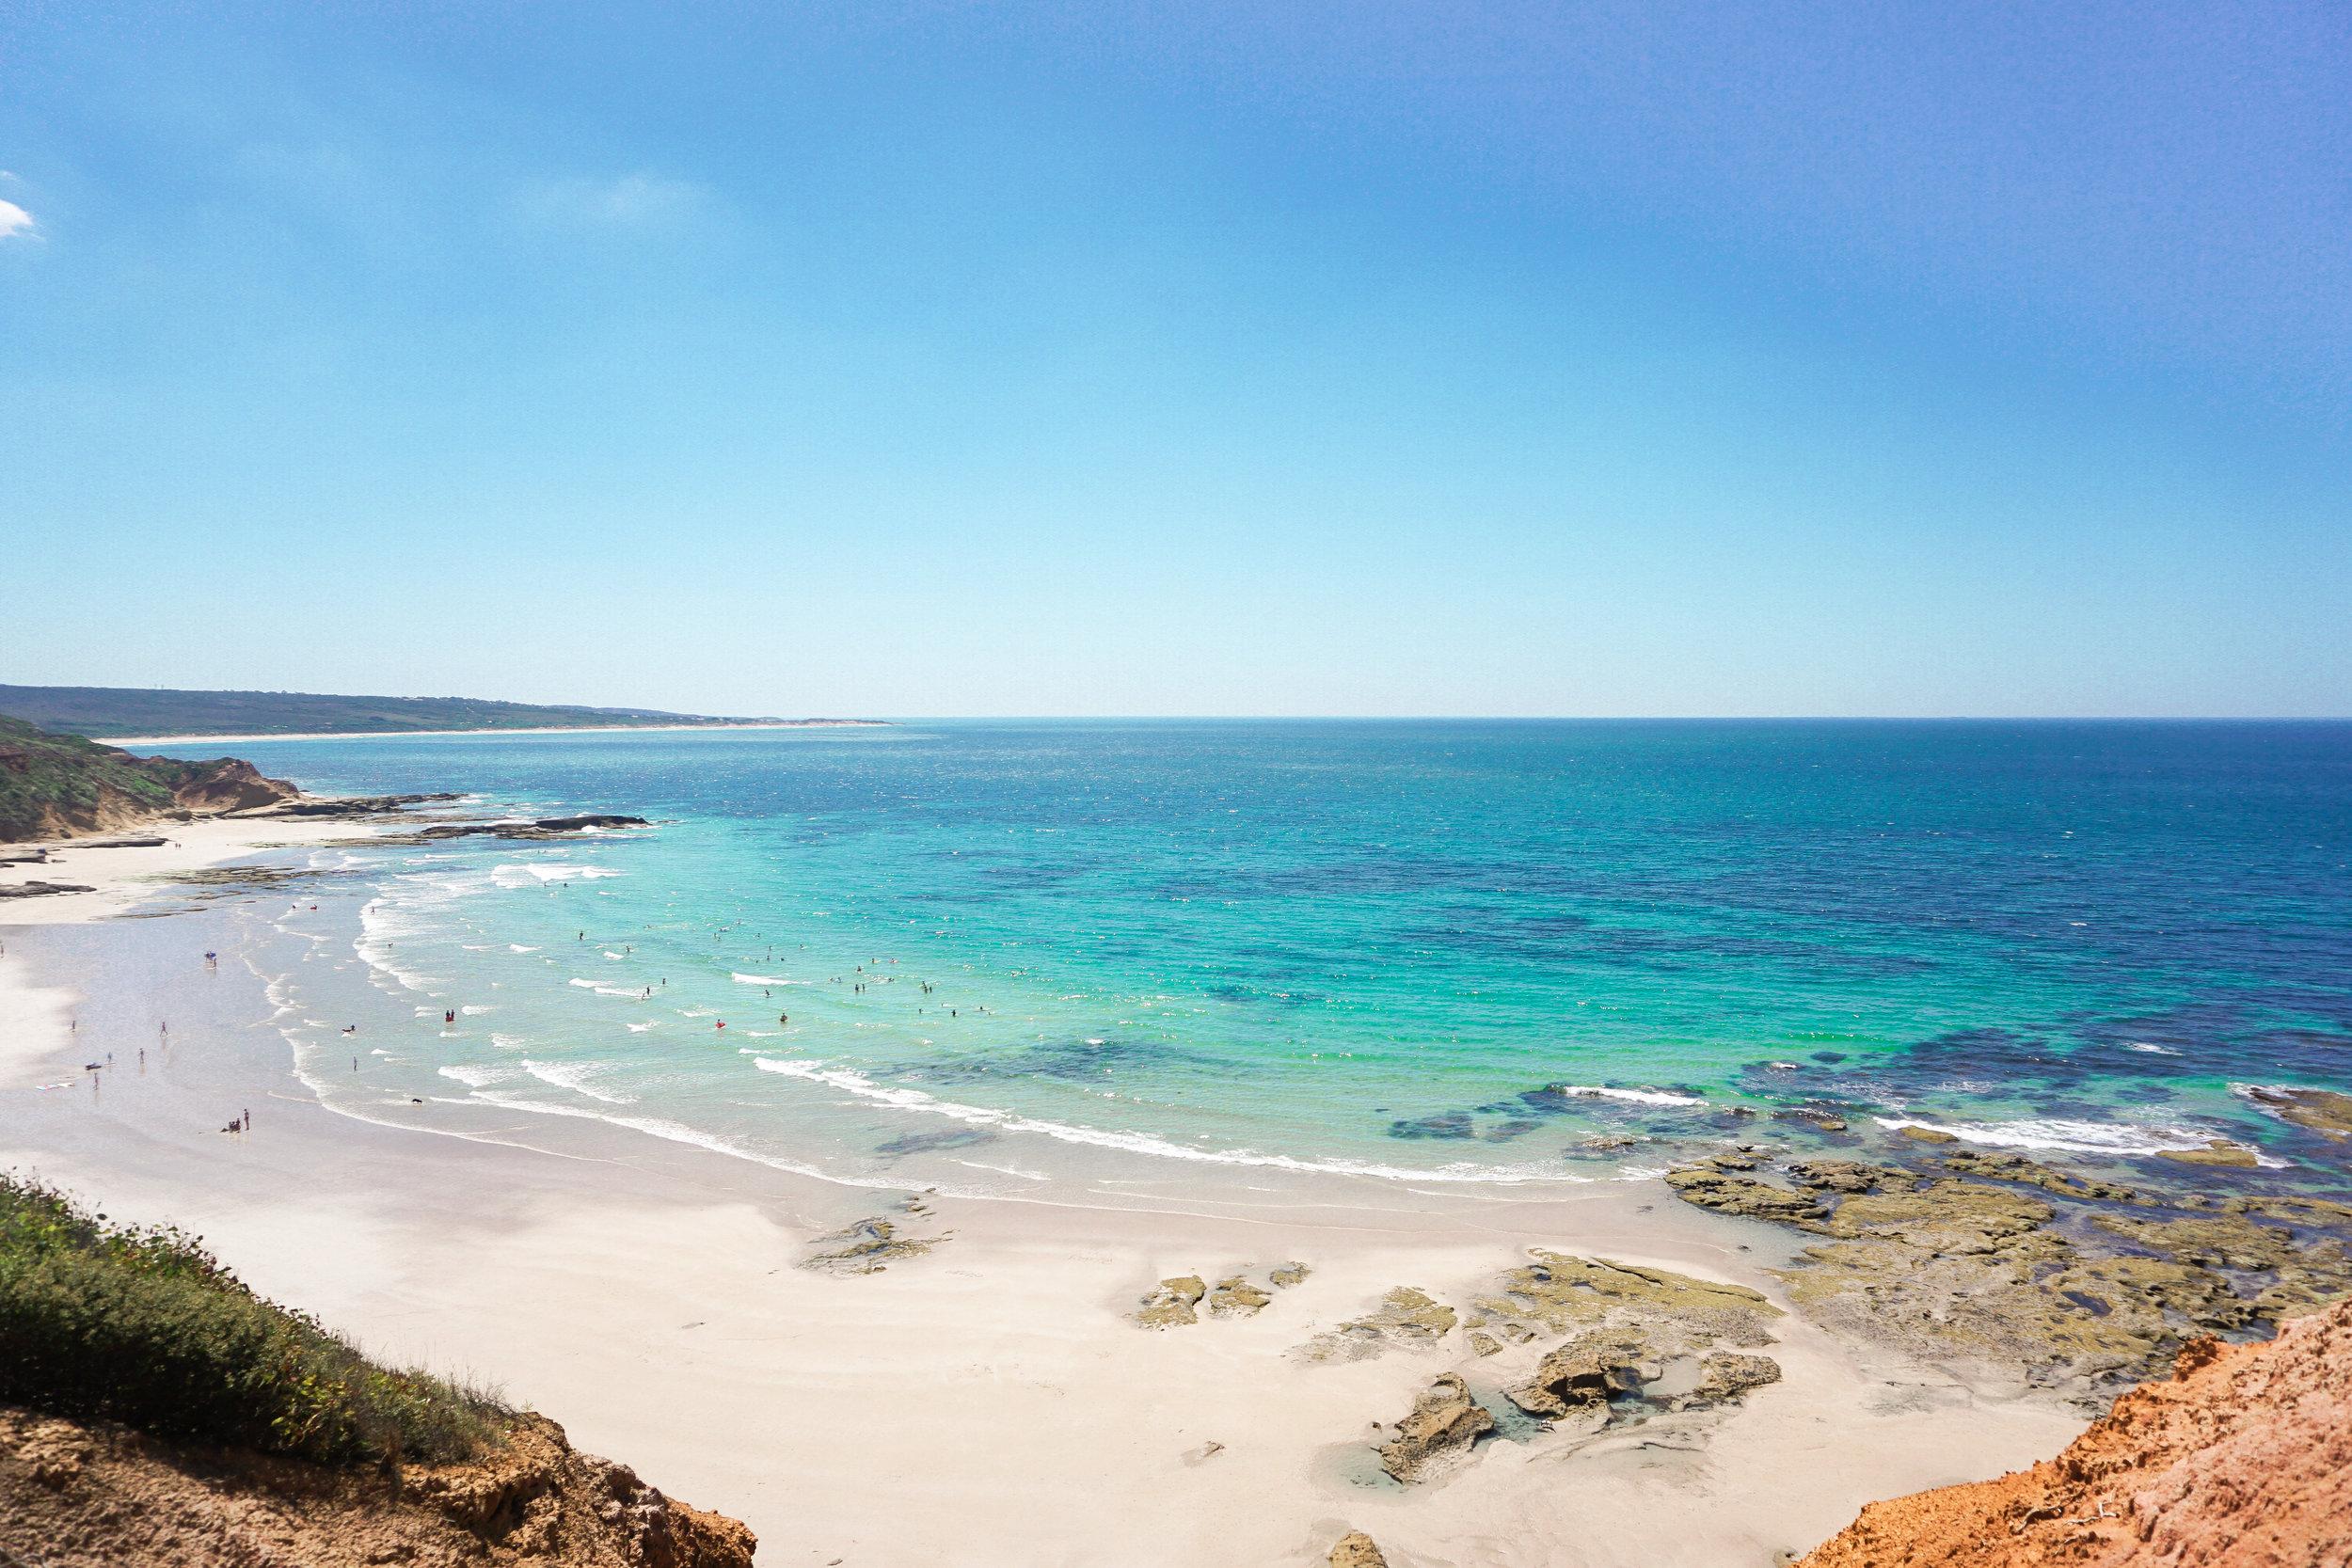 Australia - Great Ocean Road - Sunnymead Beach